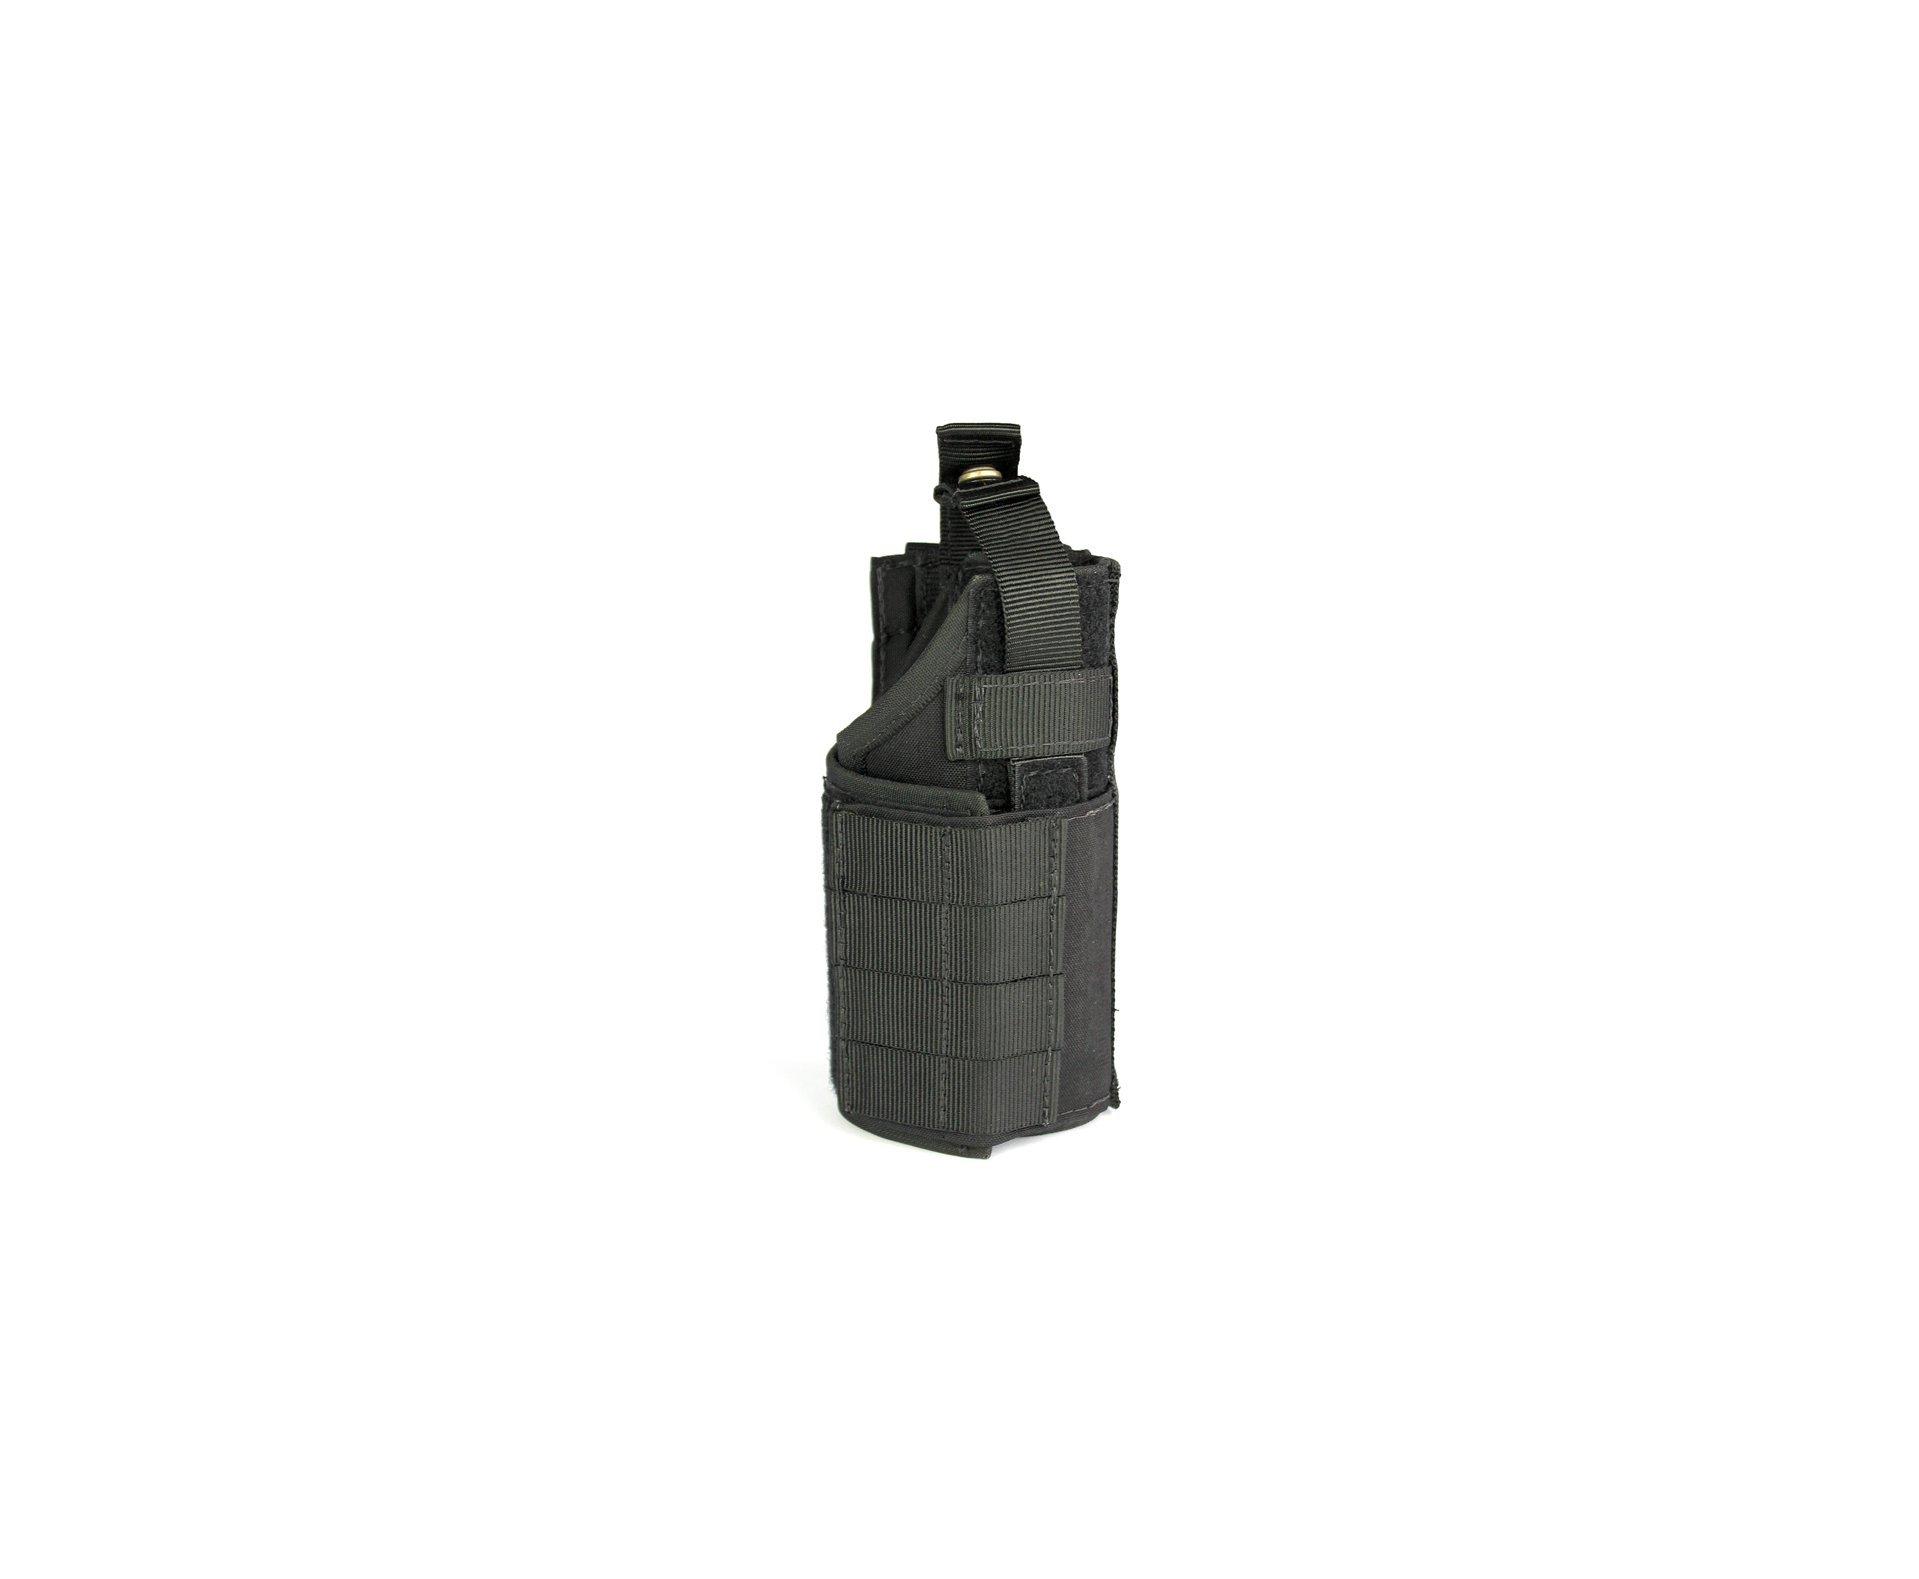 Coldre Tático Modular Preto - Dacs